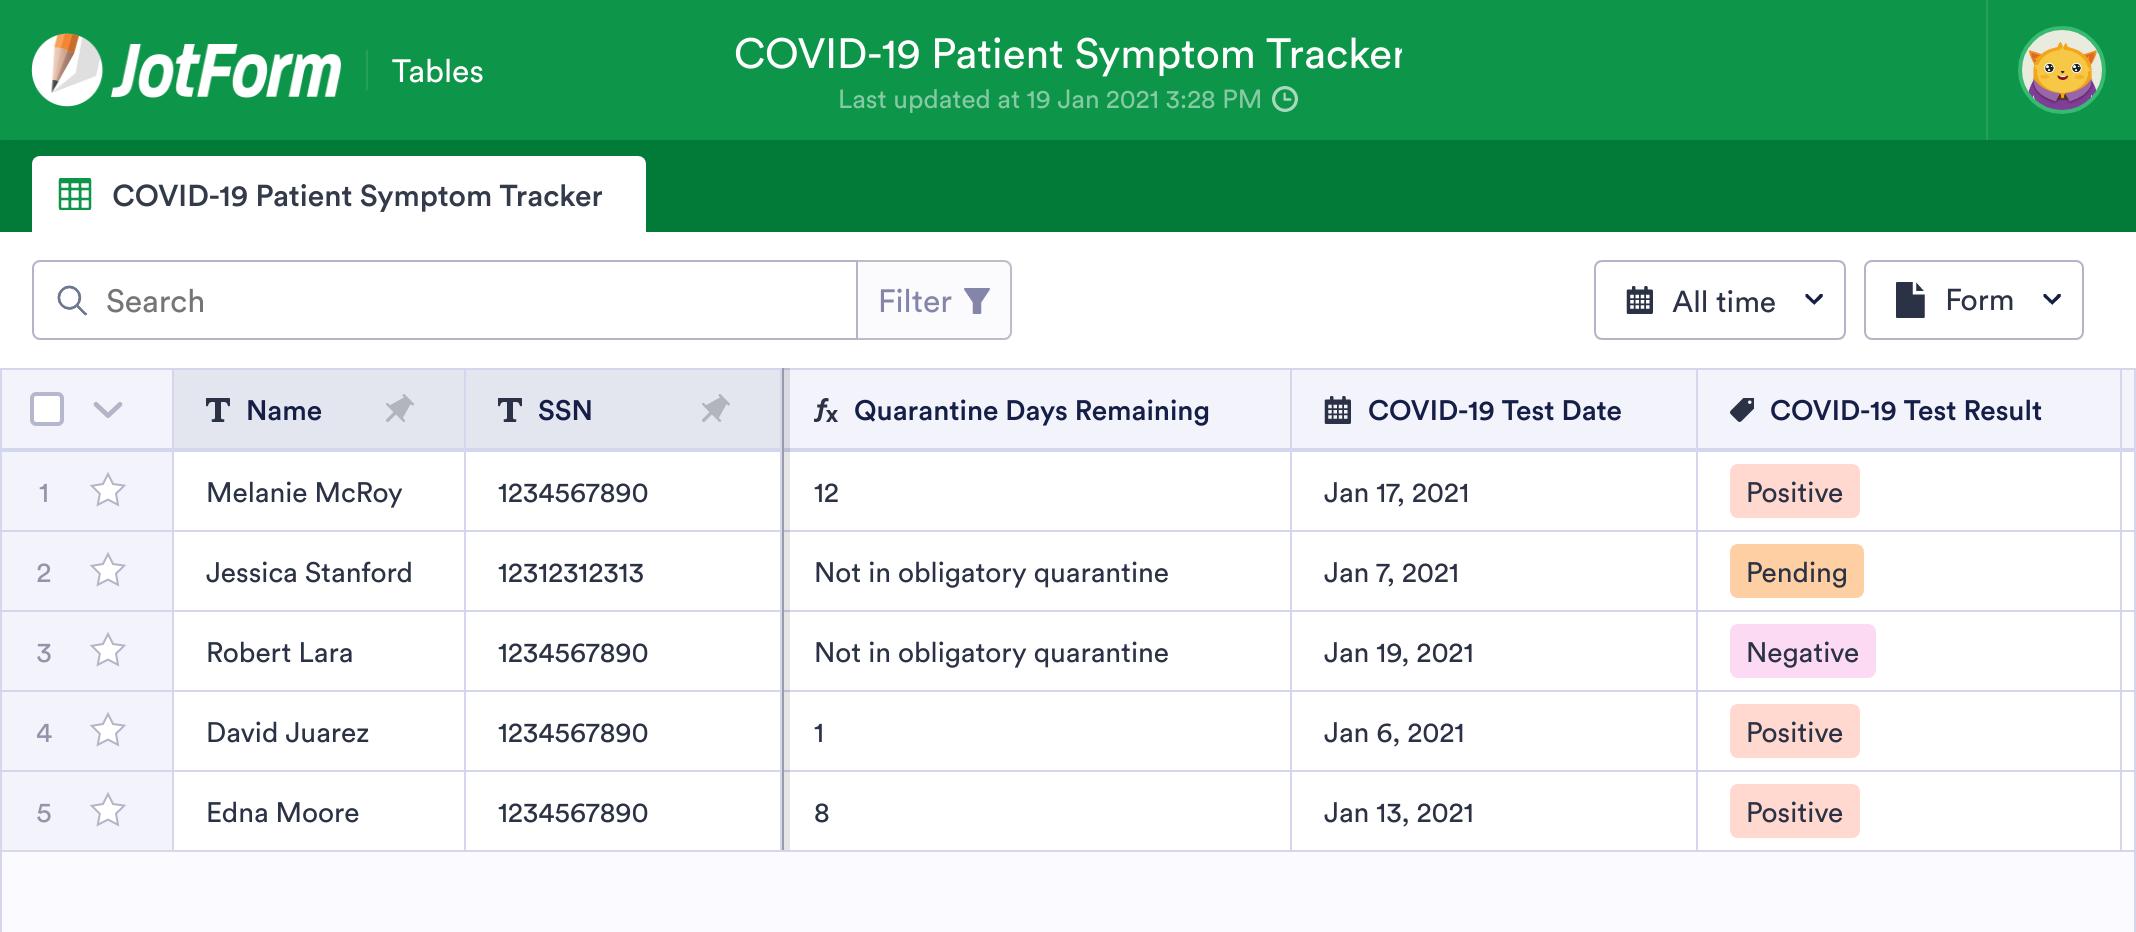 COVID-19 Patient Symptom Tracker